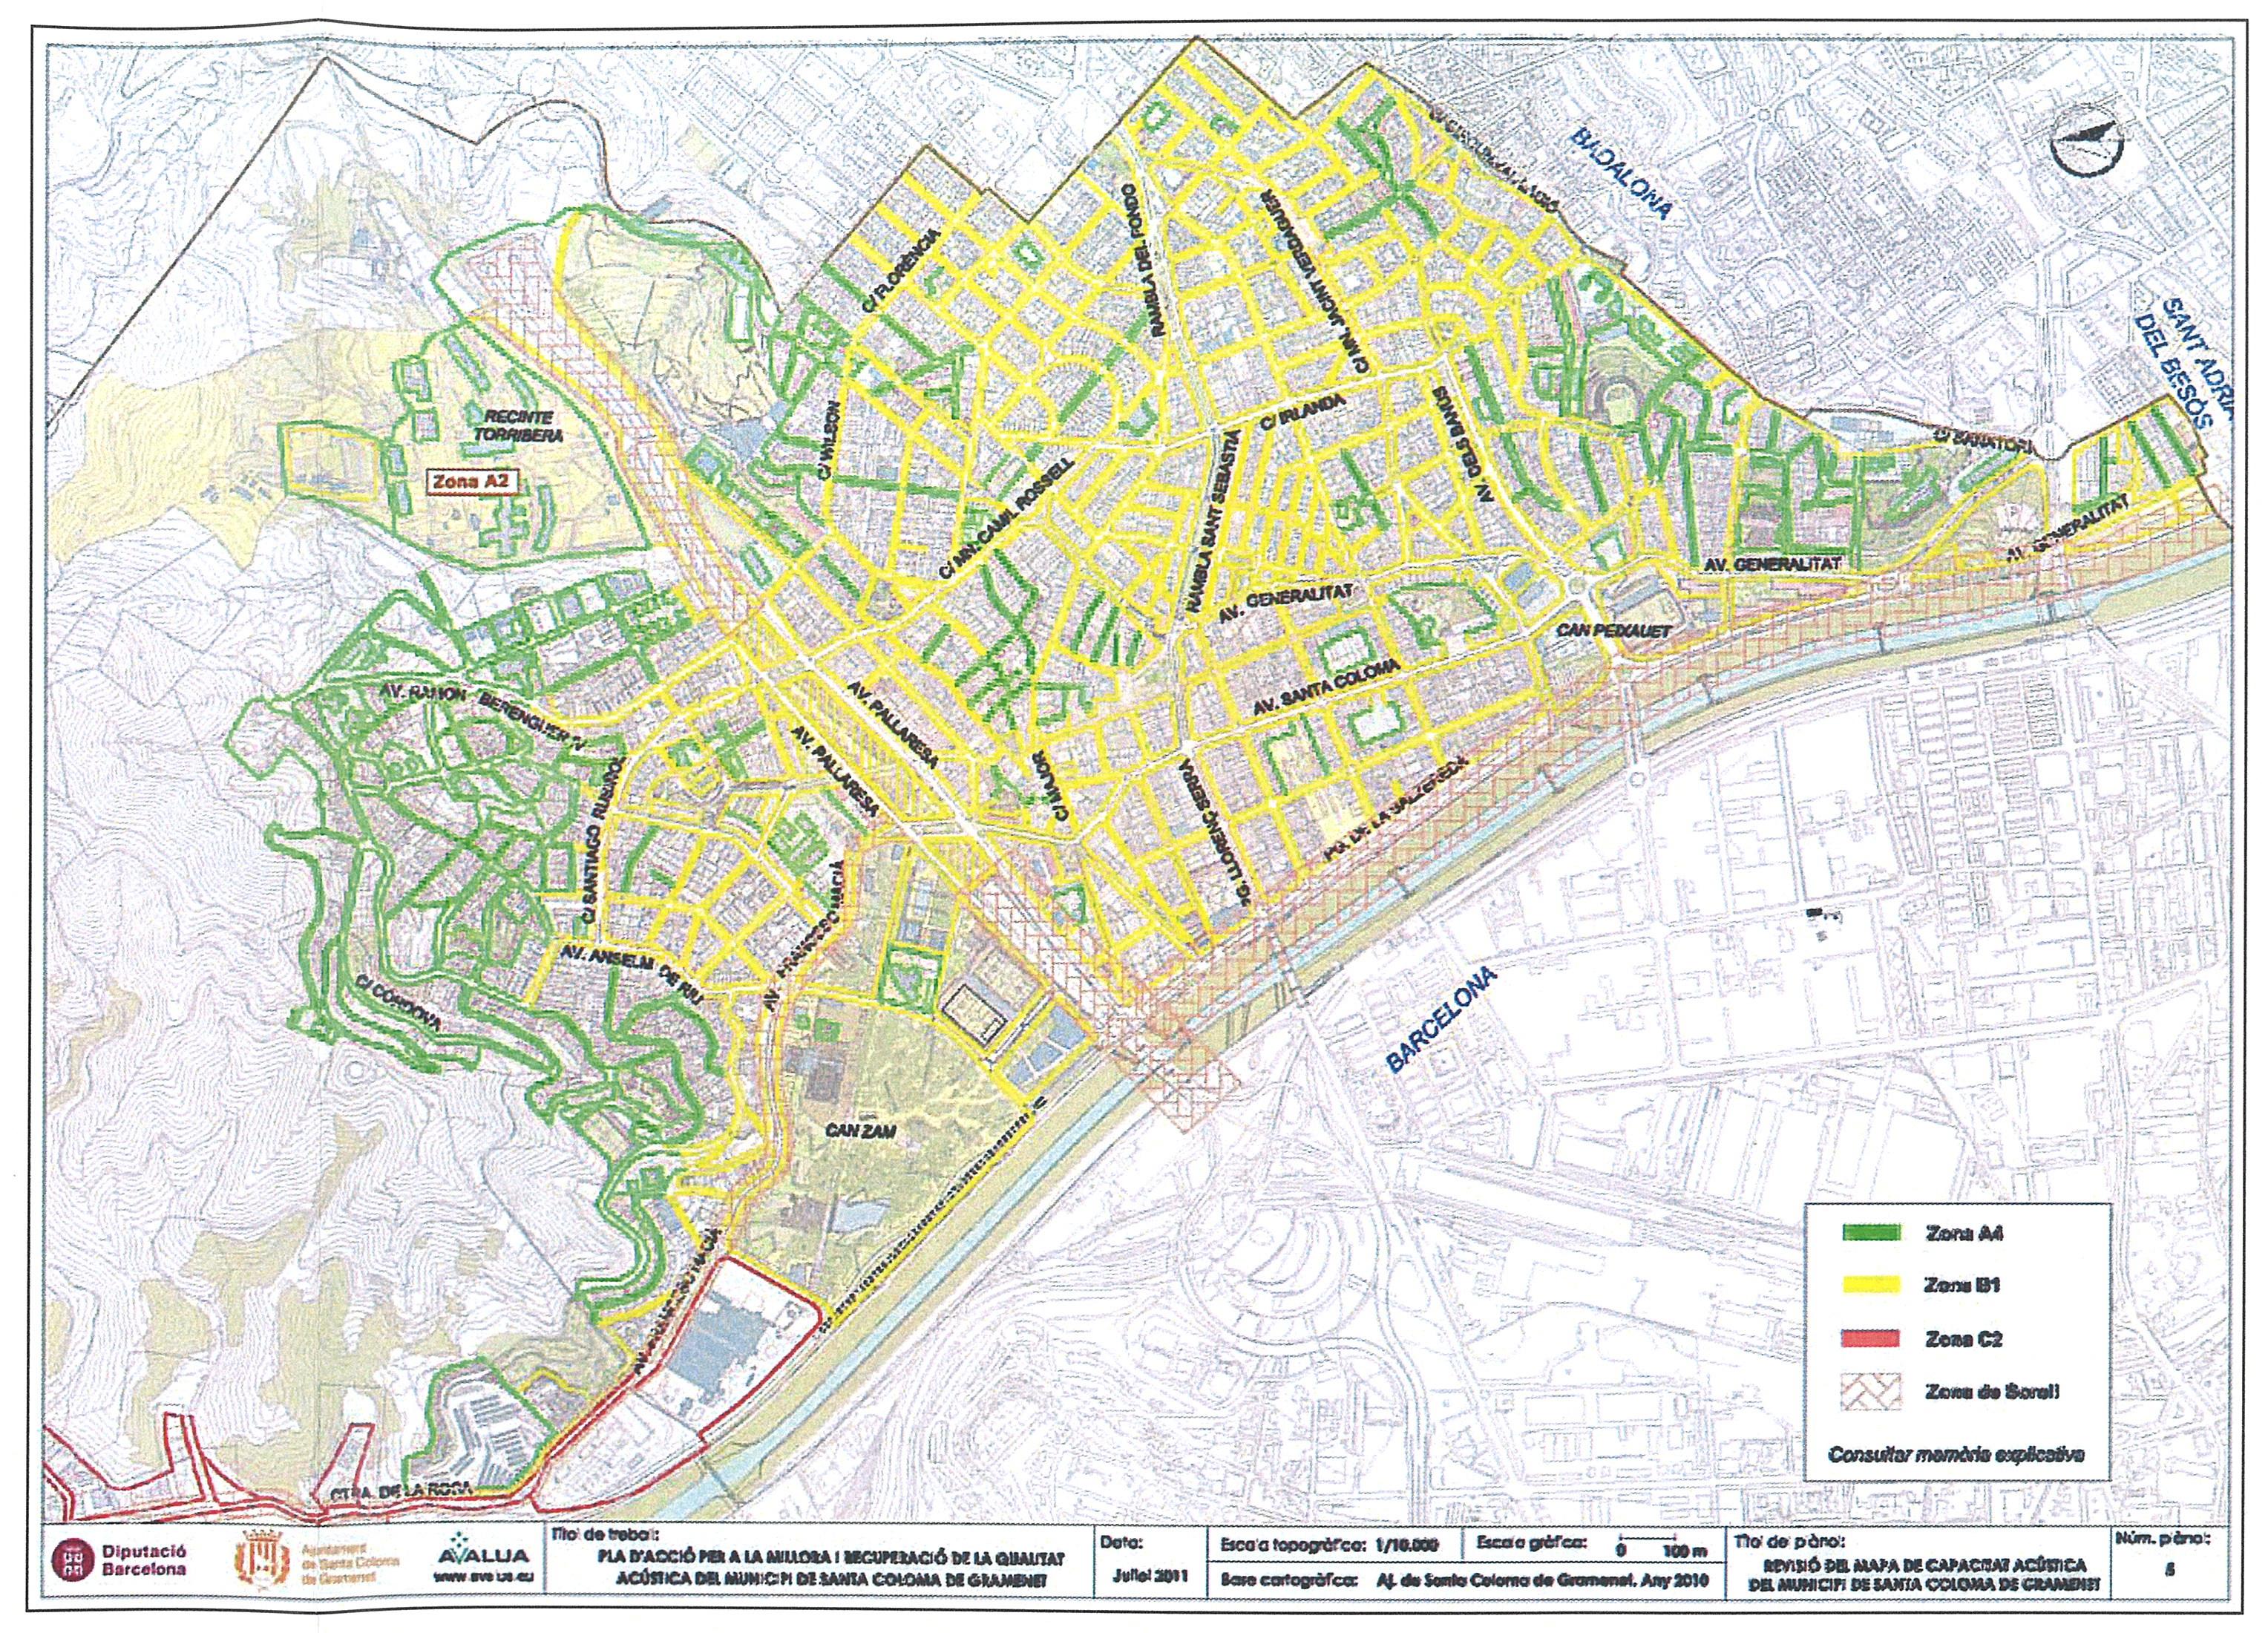 File Mapa De Capacitat 2011 Sta Coloma De Gramenet Jpg Wikimedia